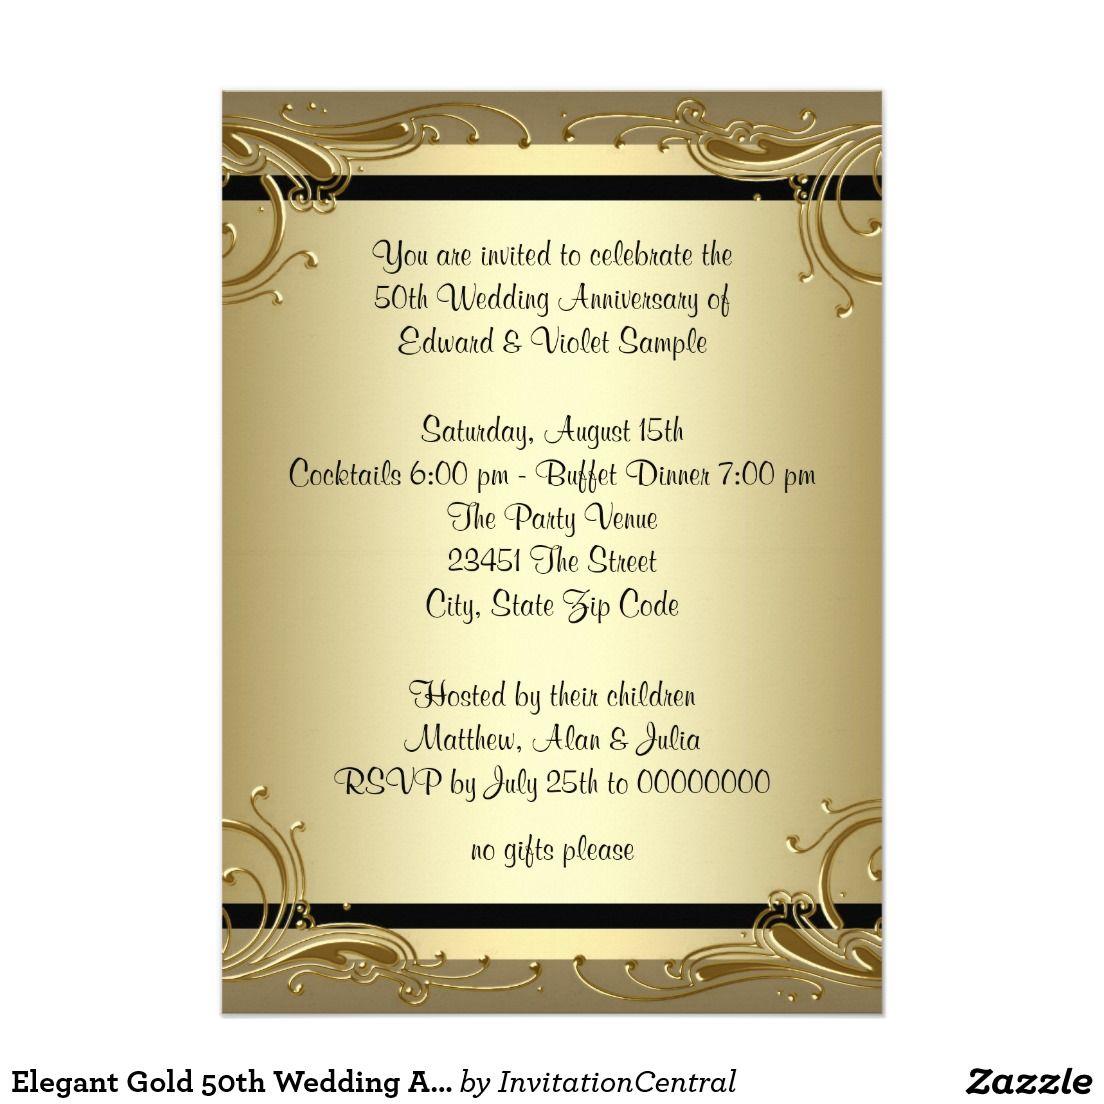 Elegant Gold 50th Wedding Anniversary Party Card | 50 Anniversary ...